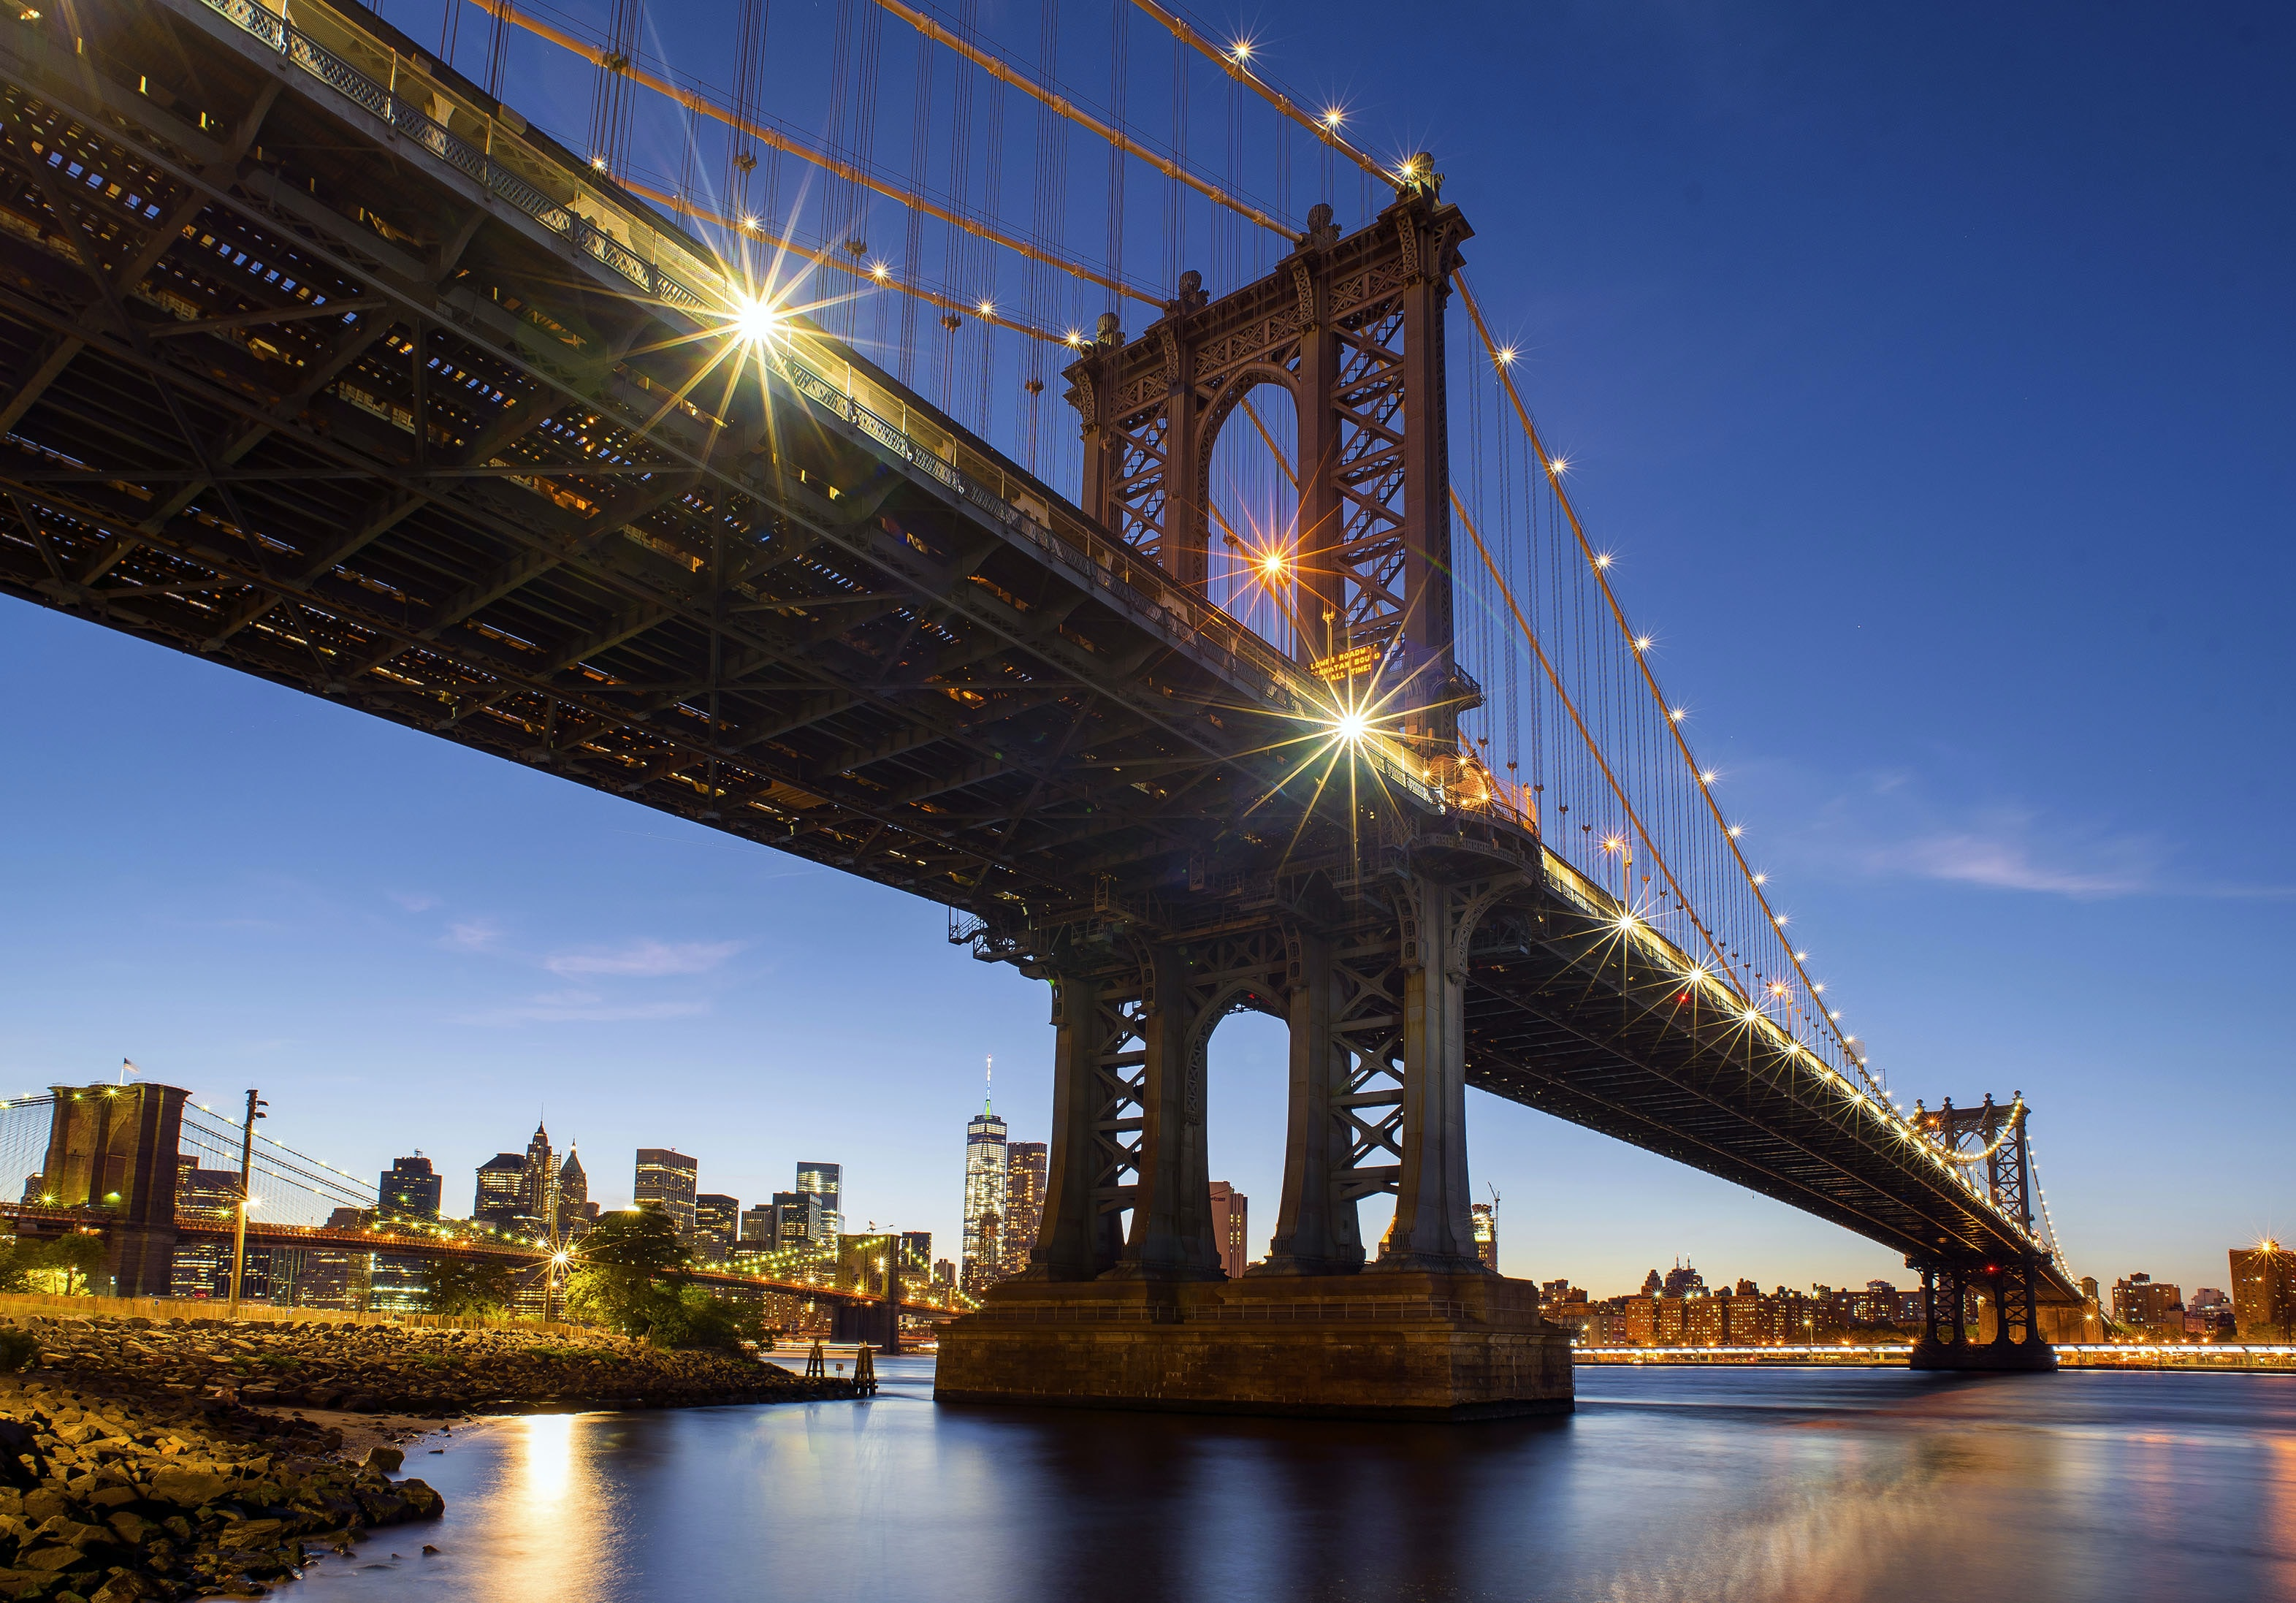 The Manhattan Bridge in New York City lit up at night